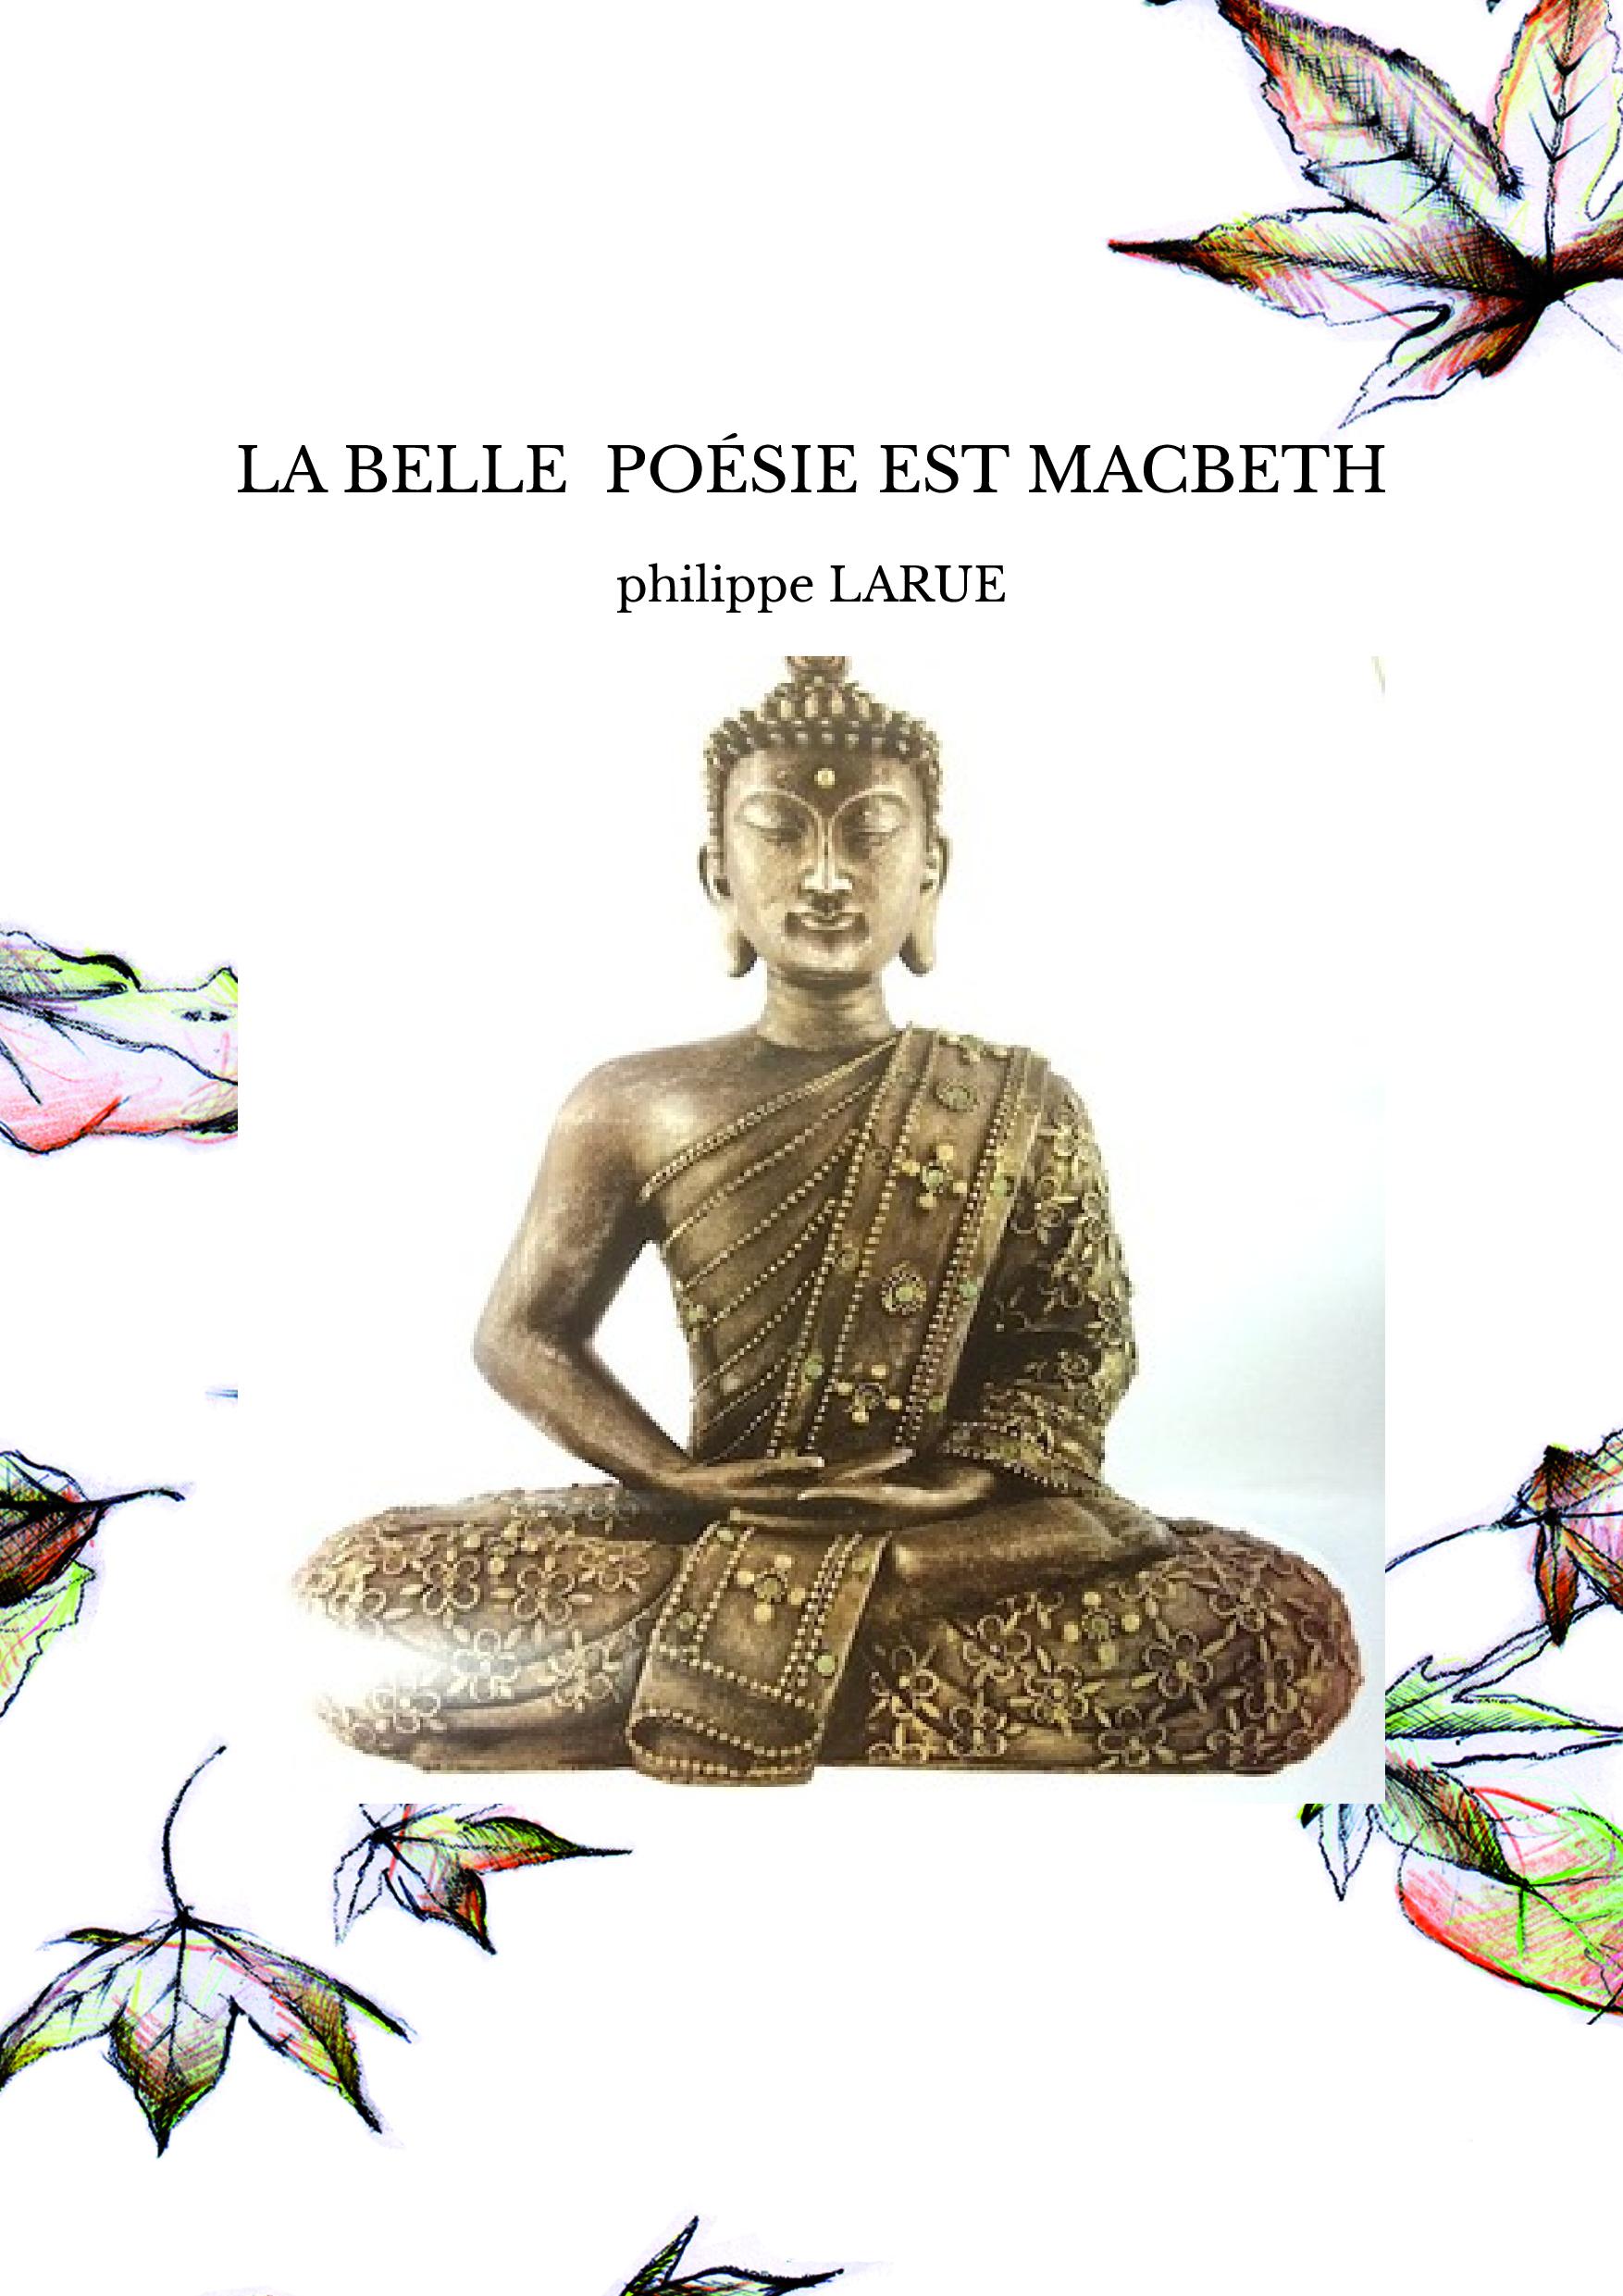 LA BELLE POÉSIE EST MACBETH